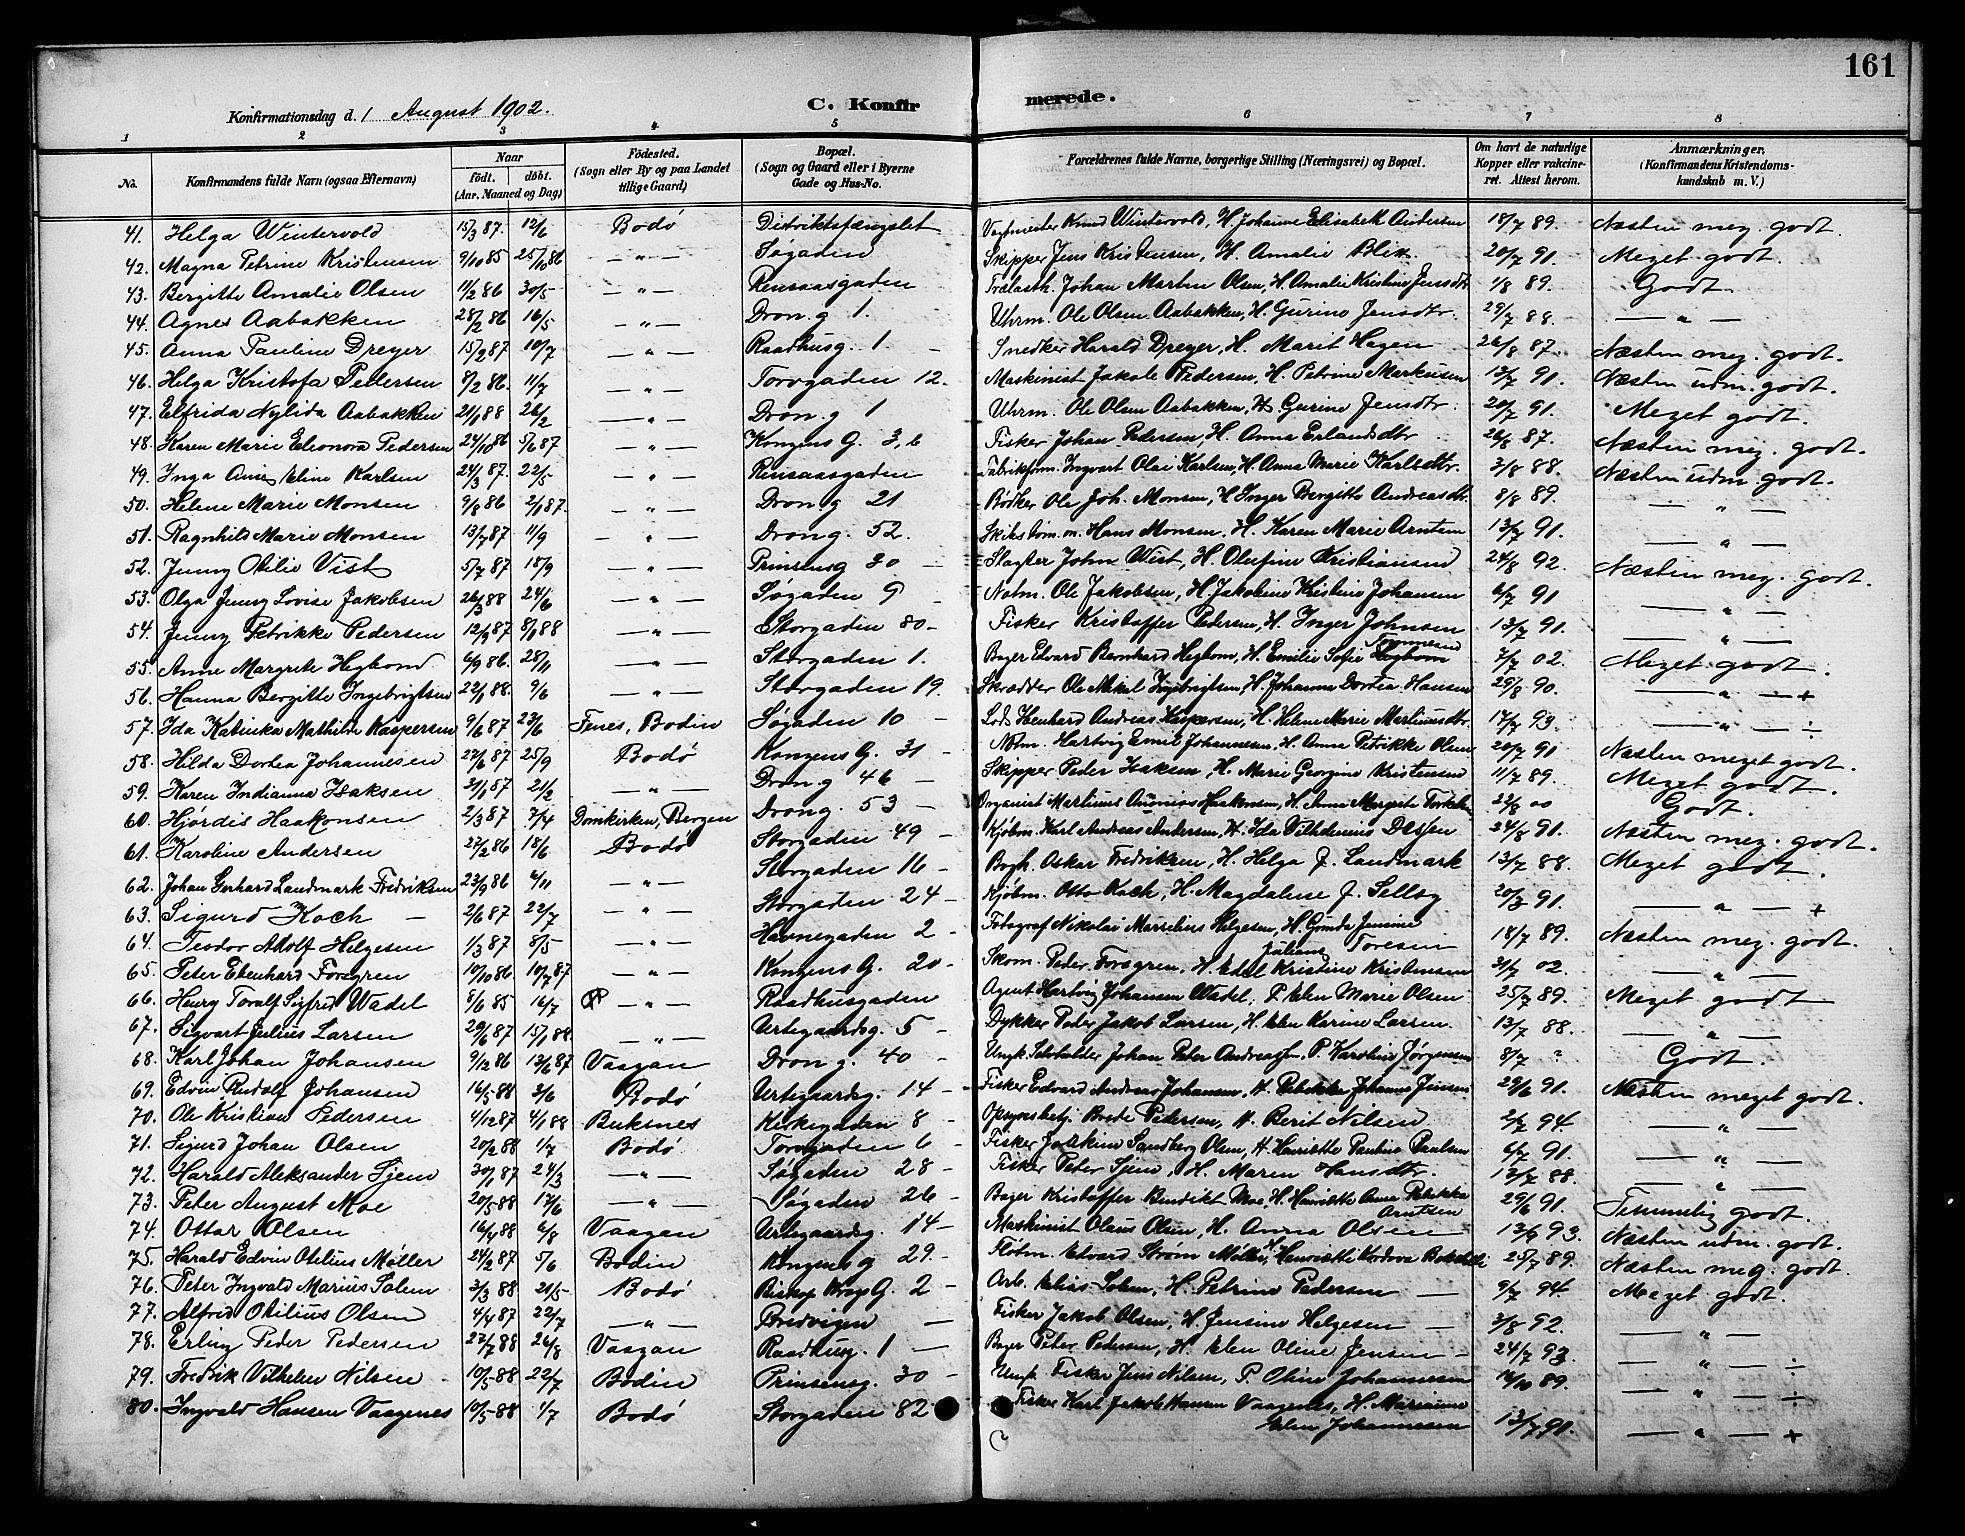 SAT, Ministerialprotokoller, klokkerbøker og fødselsregistre - Nordland, 801/L0033: Klokkerbok nr. 801C08, 1898-1910, s. 161